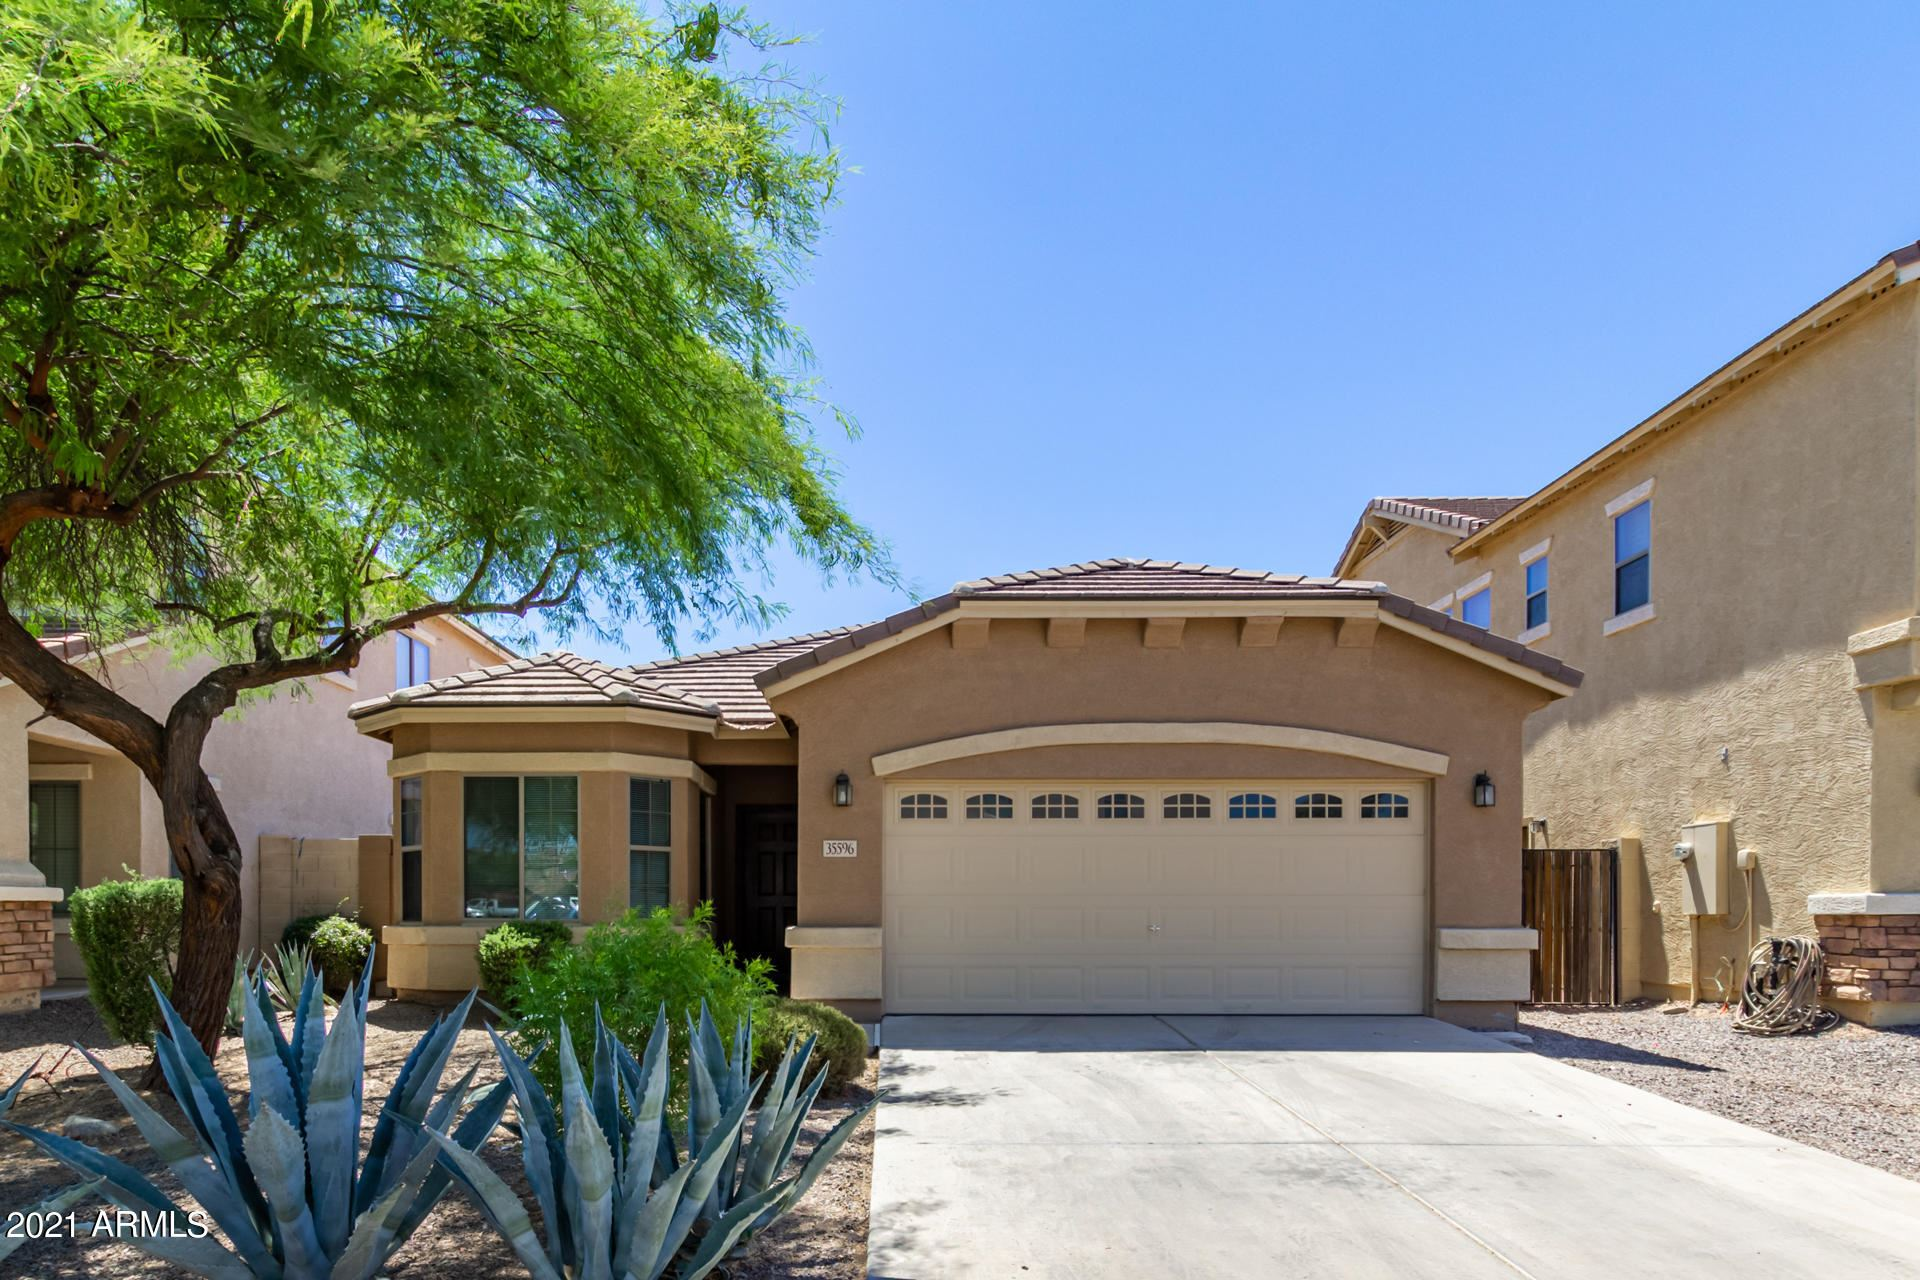 Photo of 35596 N ZACHARY Road N, Queen Creek, AZ 85142 (MLS # 6248910)